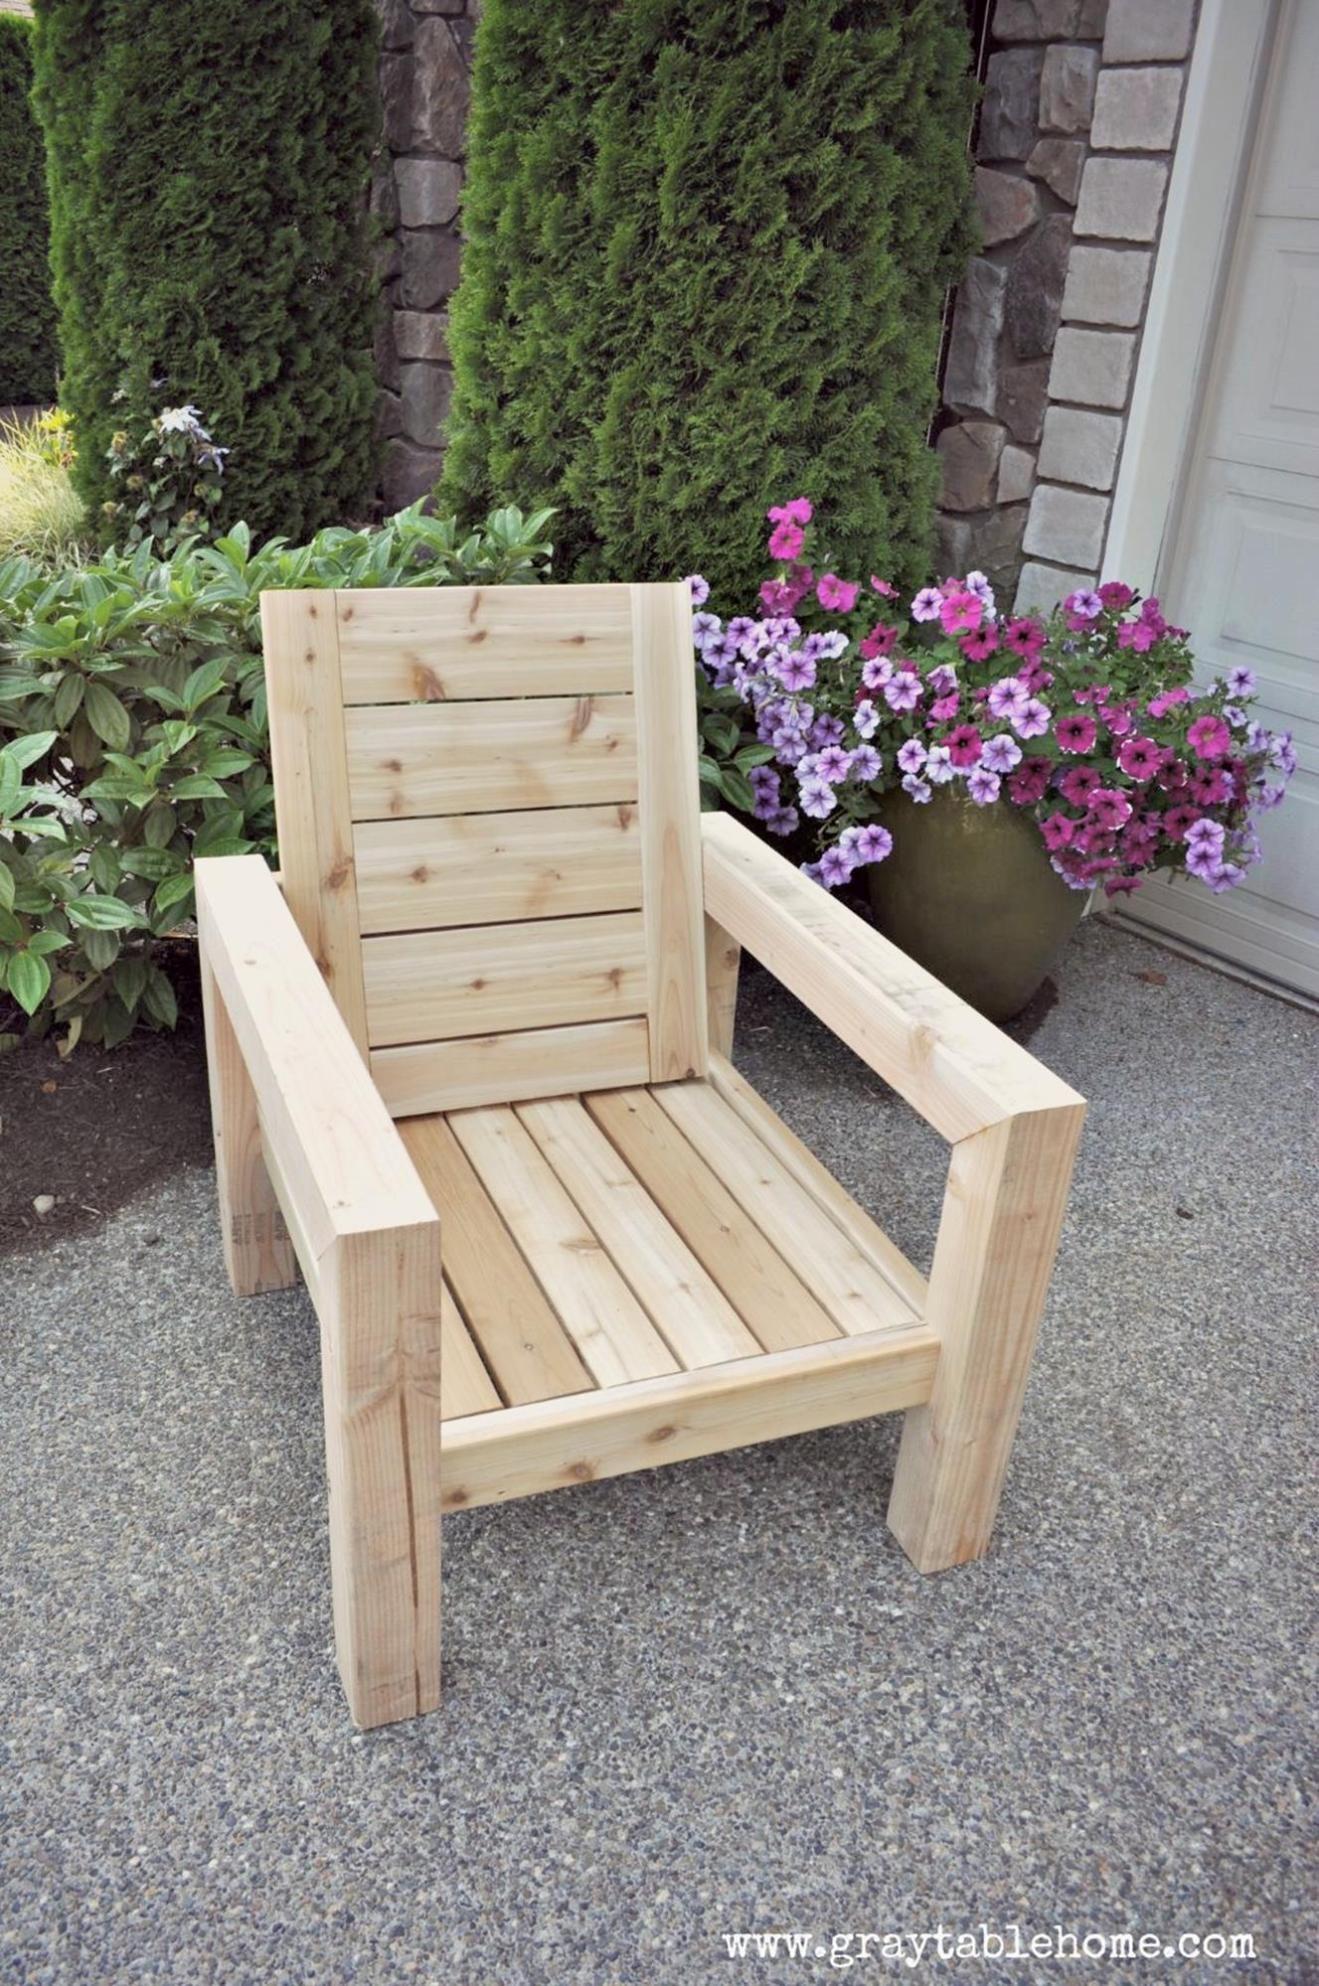 Diy Rustic Patio Furniture Plans Ideas 26 Diy Garden Furniture Rustic Outdoor Chairs Rustic Patio Furniture